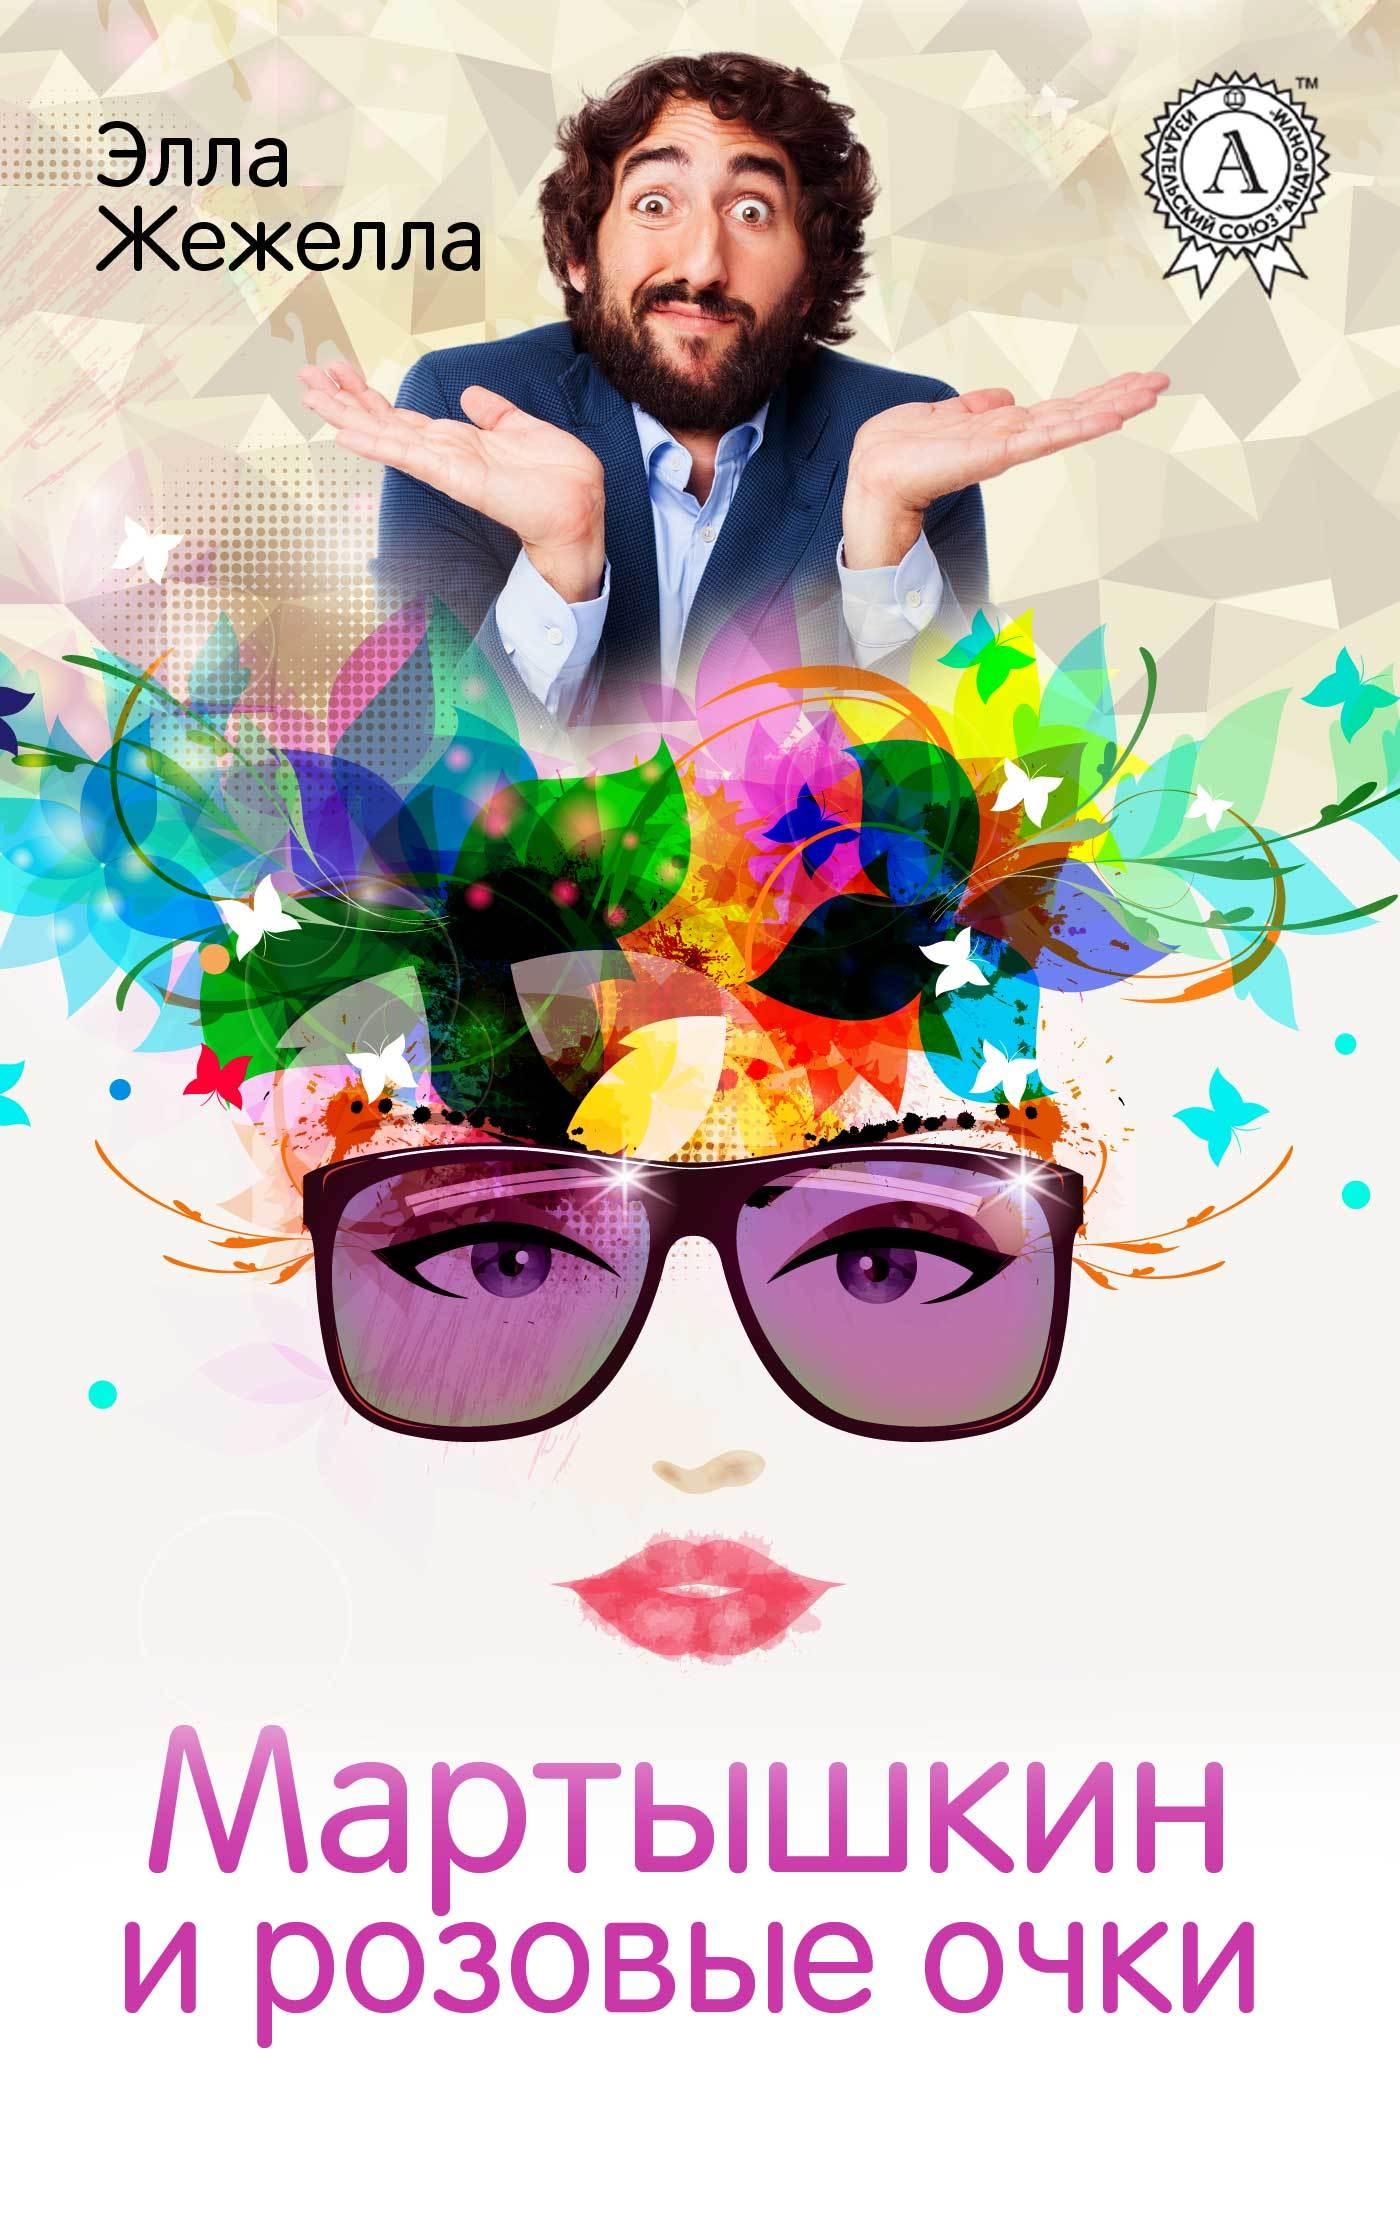 Элла Жежелла - Мартышкин и розовые очки